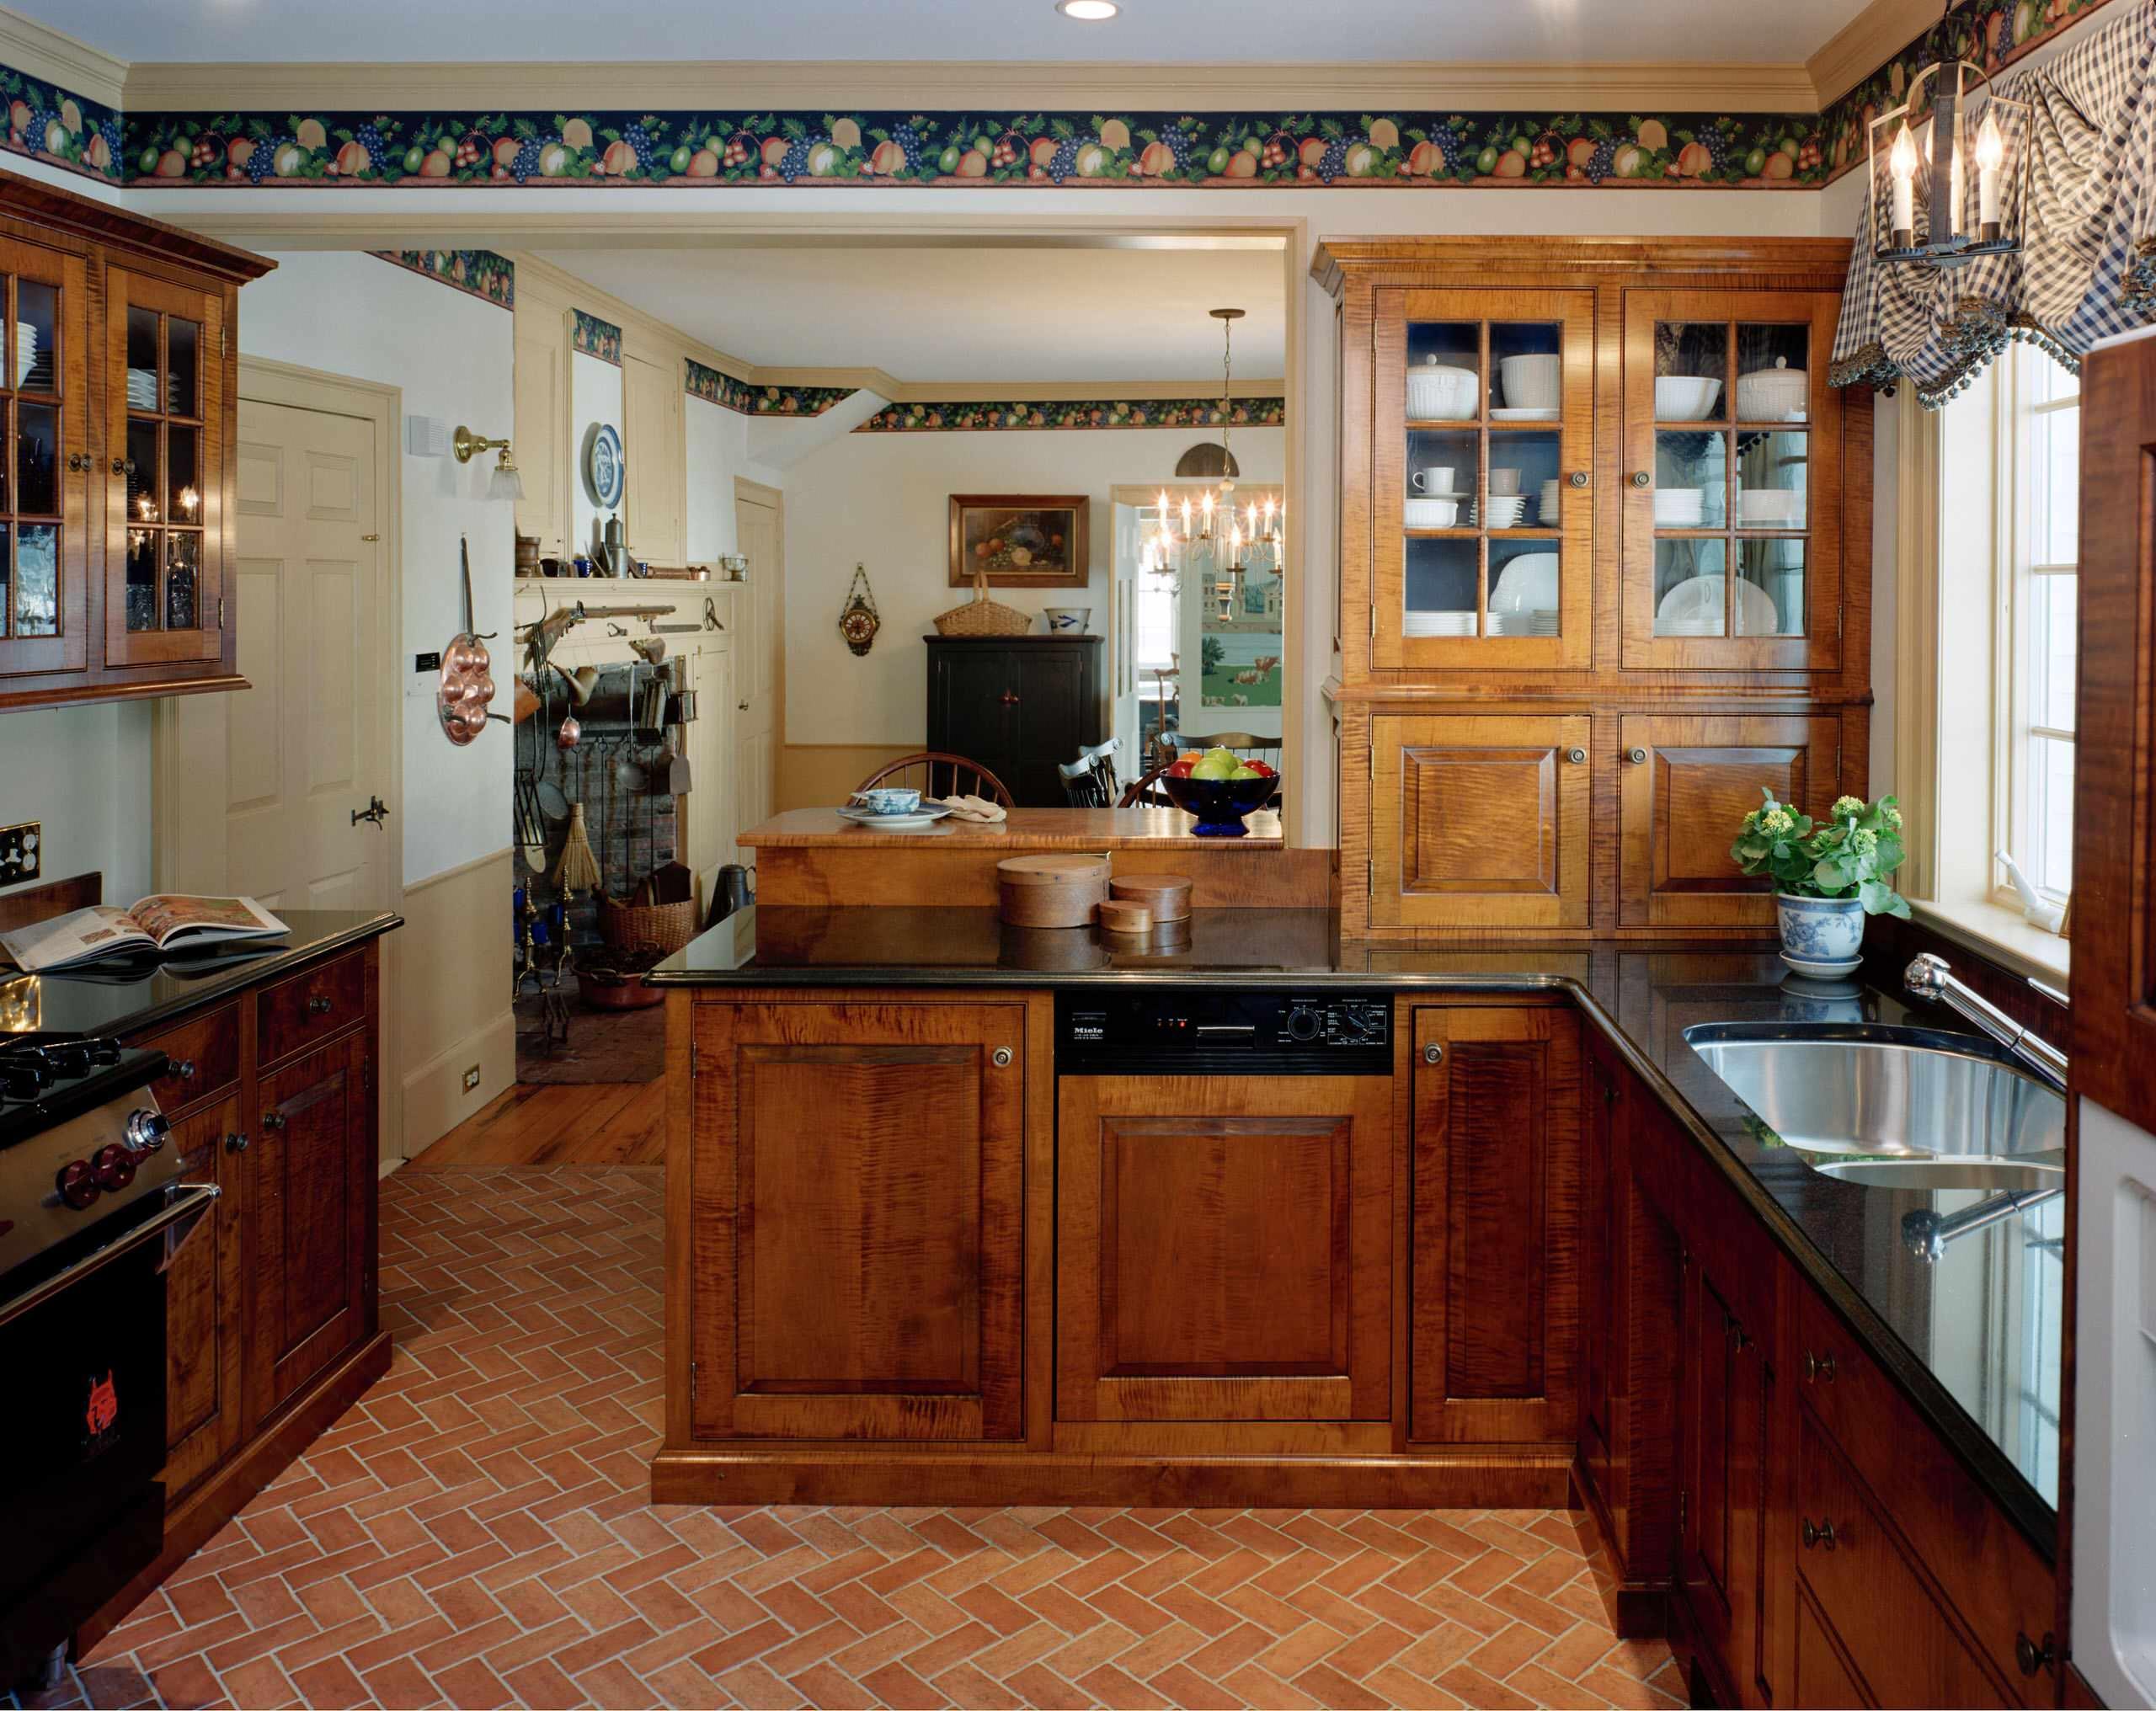 Antique Colonial, Newburyport, MA   Traditional   Kitchen   Boston ...